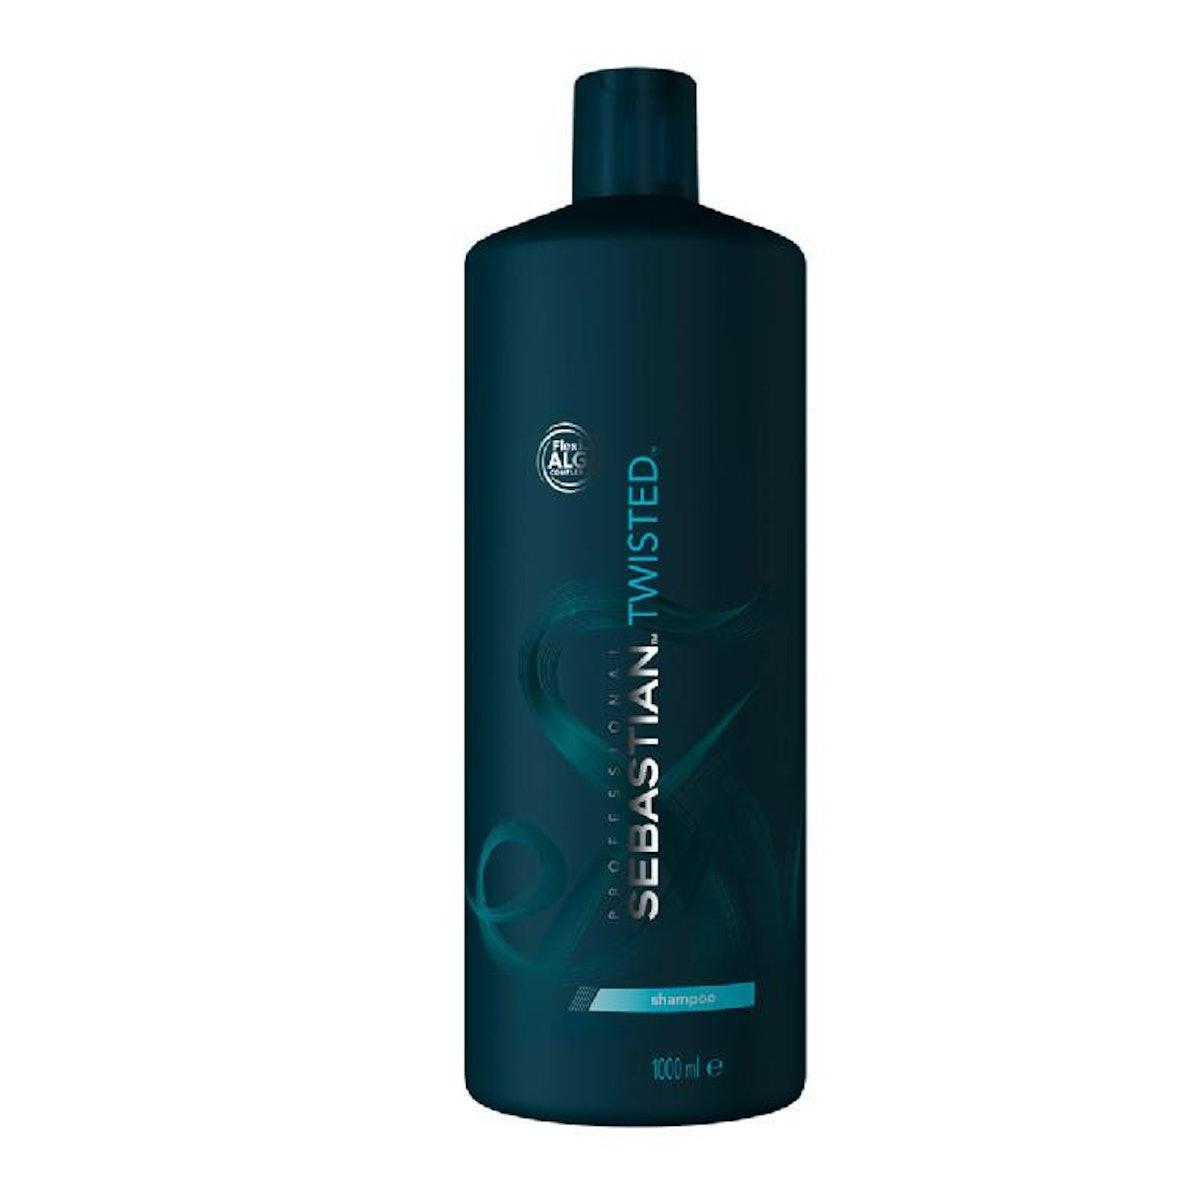 Sebastian Twisted Curl Shampoo